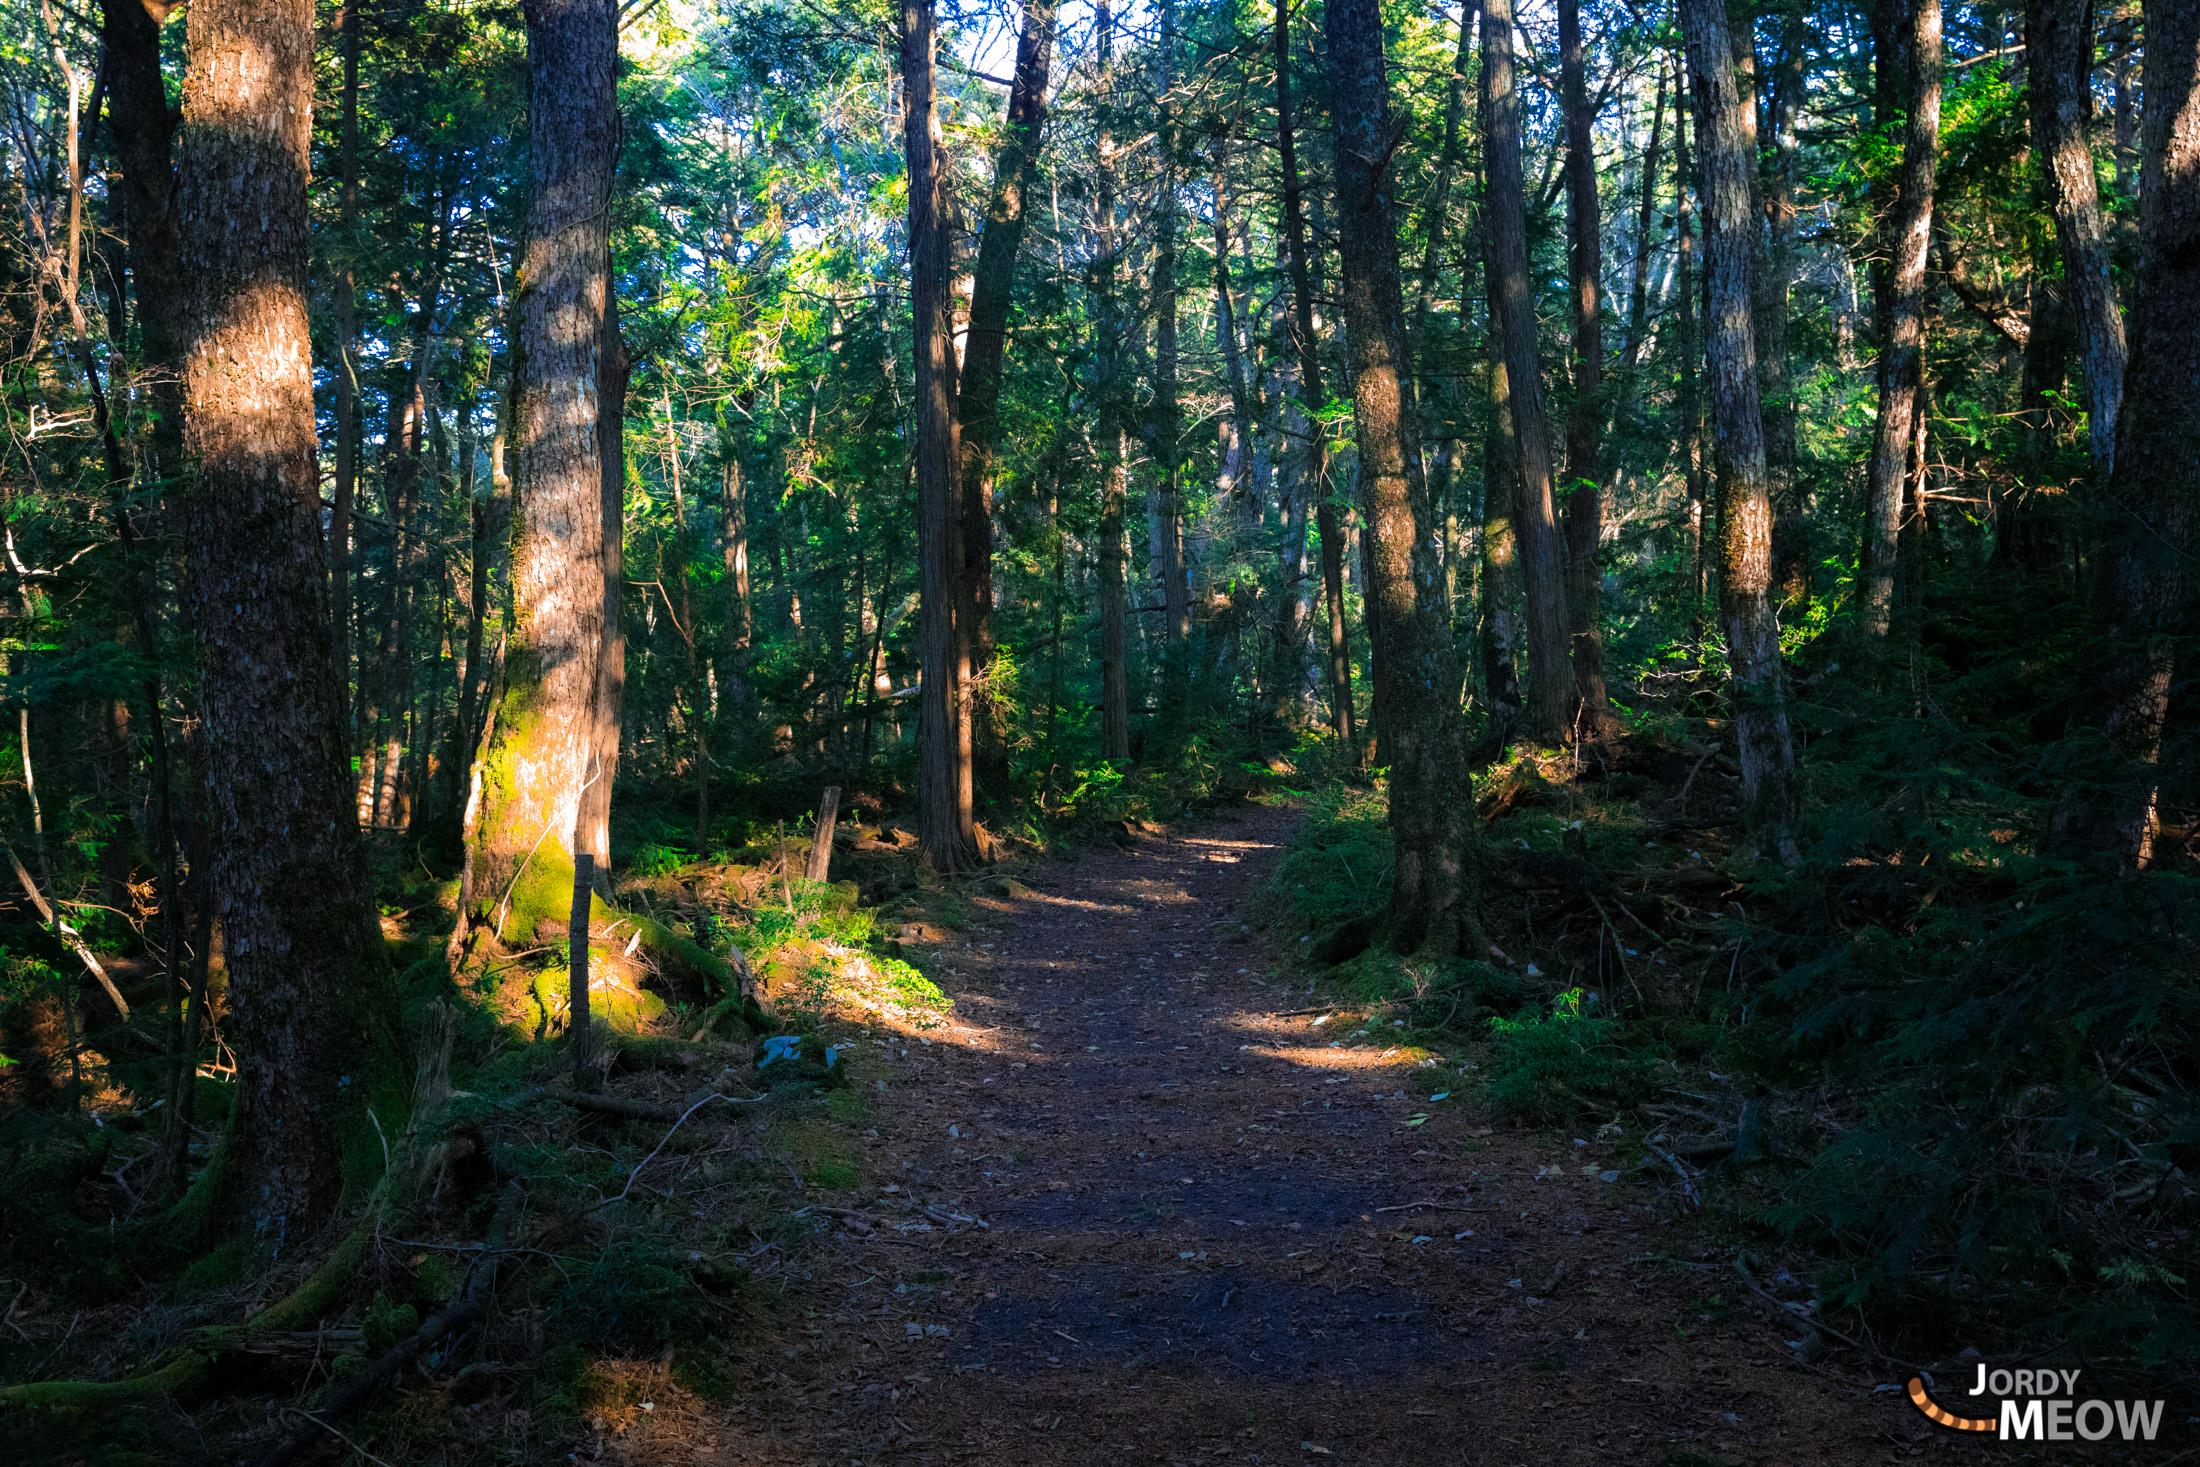 chubu, forest, japan, japanese, jukai, natural, nature, yamanashi